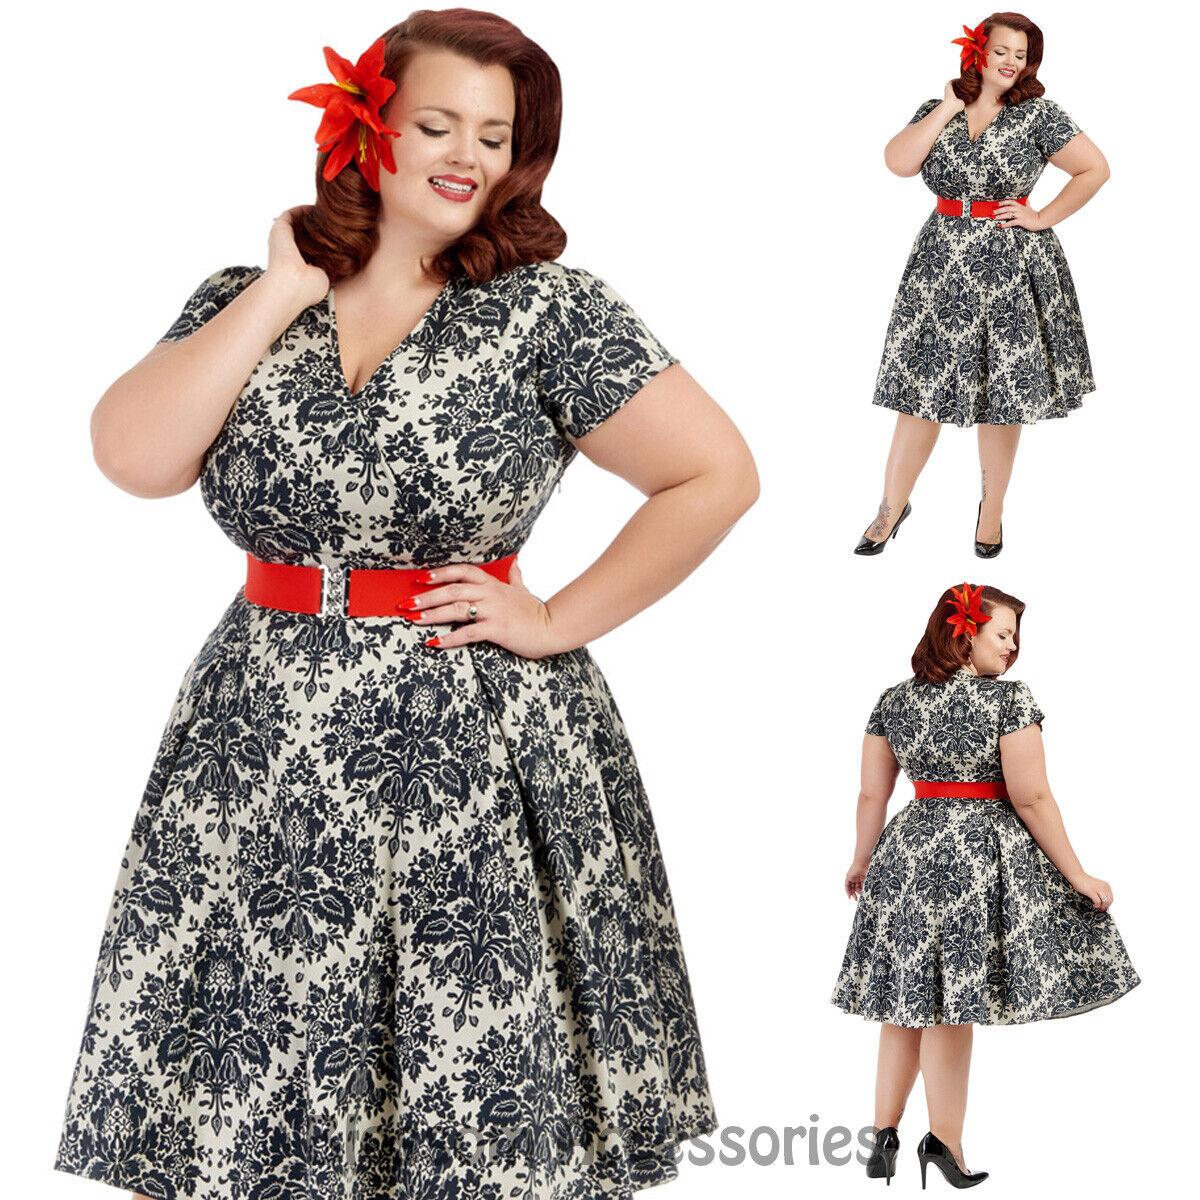 RKL33 Lady Vintage Damask Plus Dress Swing Retro Rockabilly Pin Up Party Formal